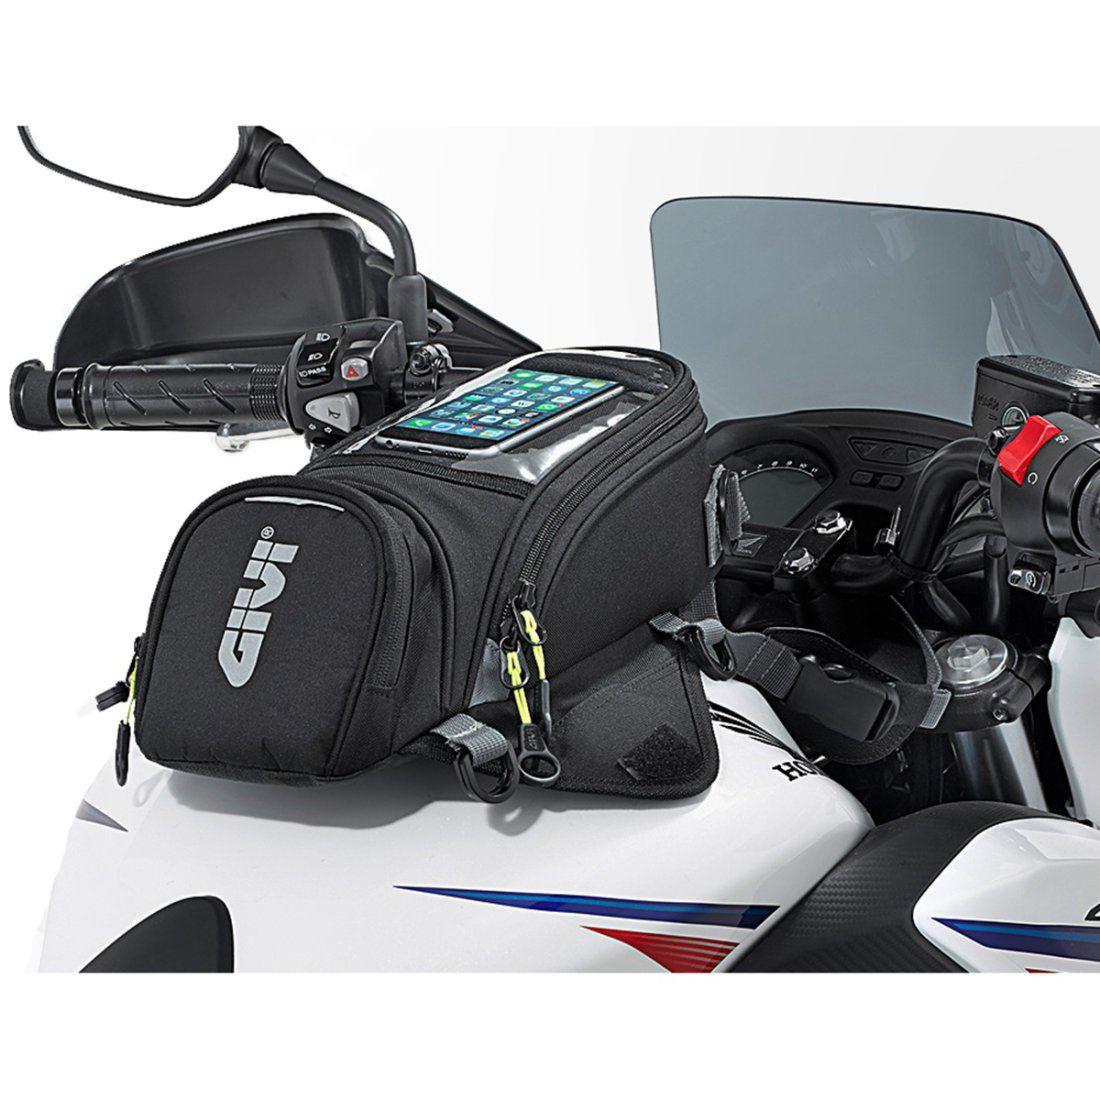 Bolsa Magnética para Tanque Givi EA106B 6Lt.  - Nova Suzuki Motos e Acessórios